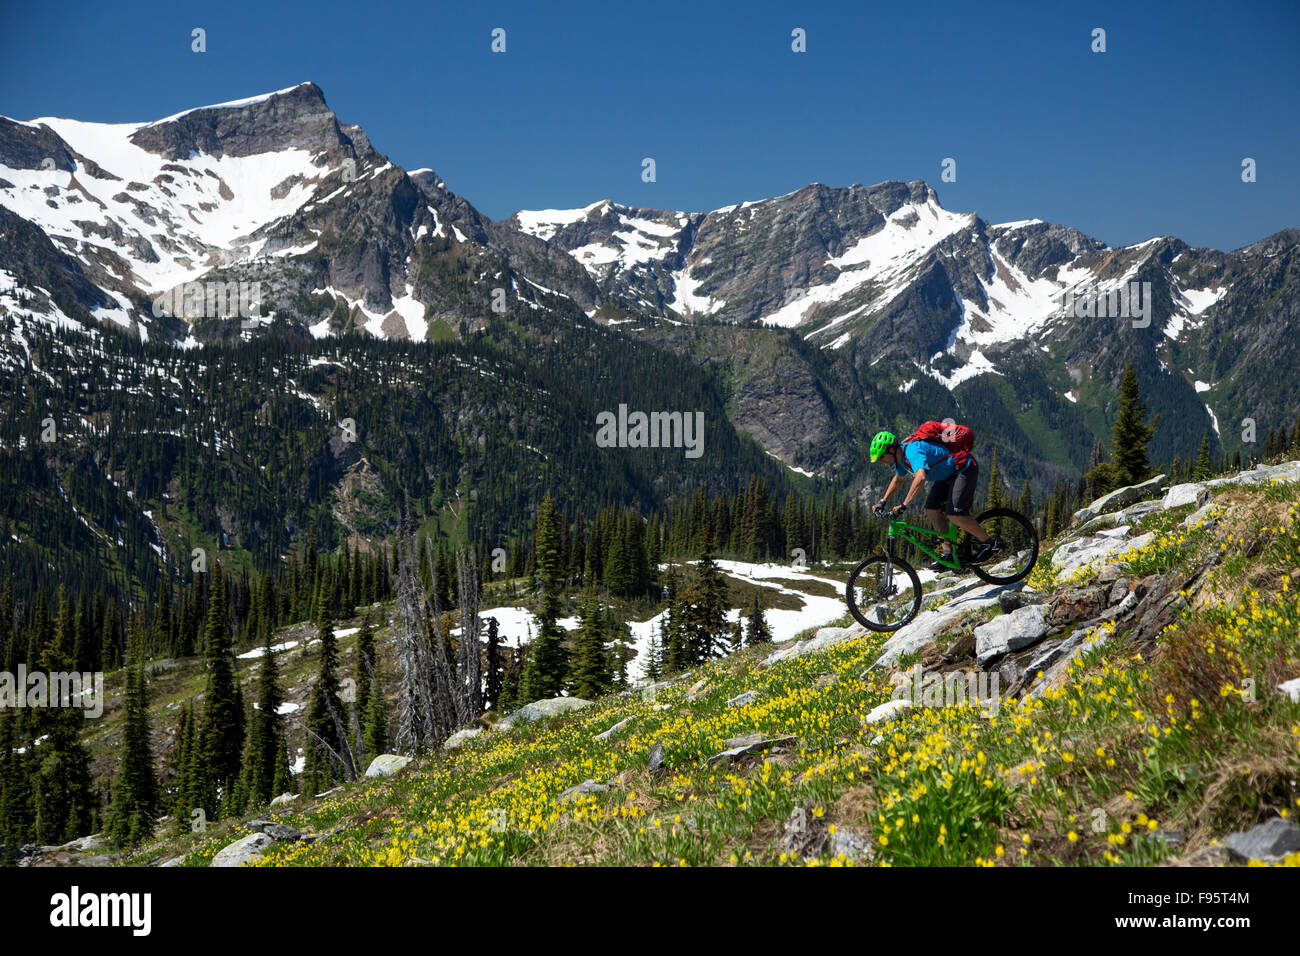 Le vélo de montagne, Glacier, Lily Erythronium grandiflorum, Sol Mountain Lodge, montagnes Monashee, Revelstoke Photo Stock